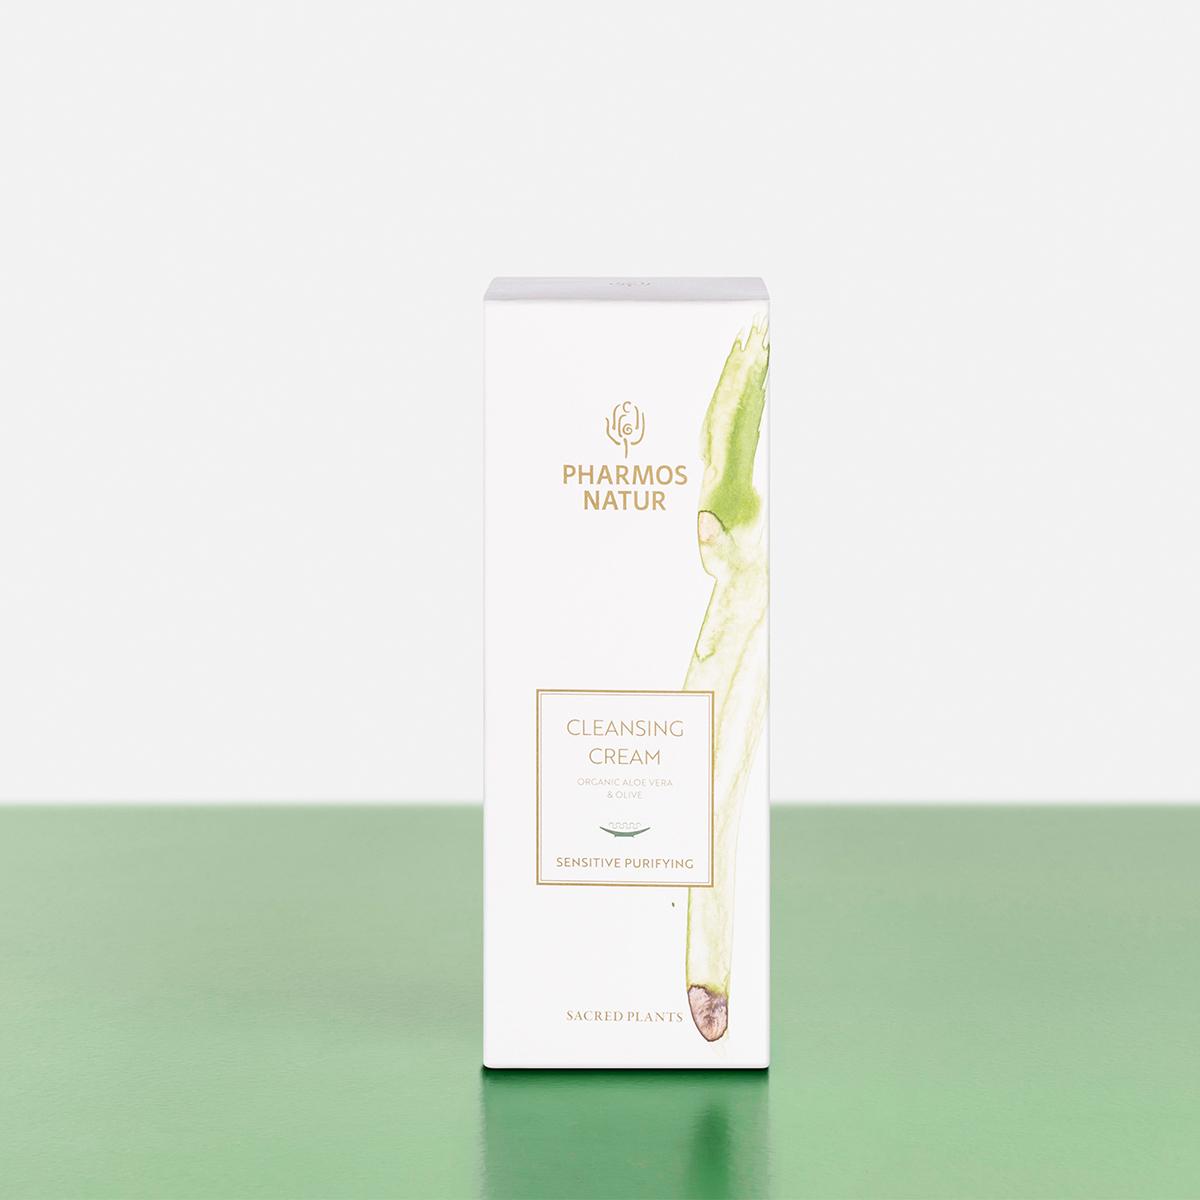 Verpackung Cleansing Cream Produktbild